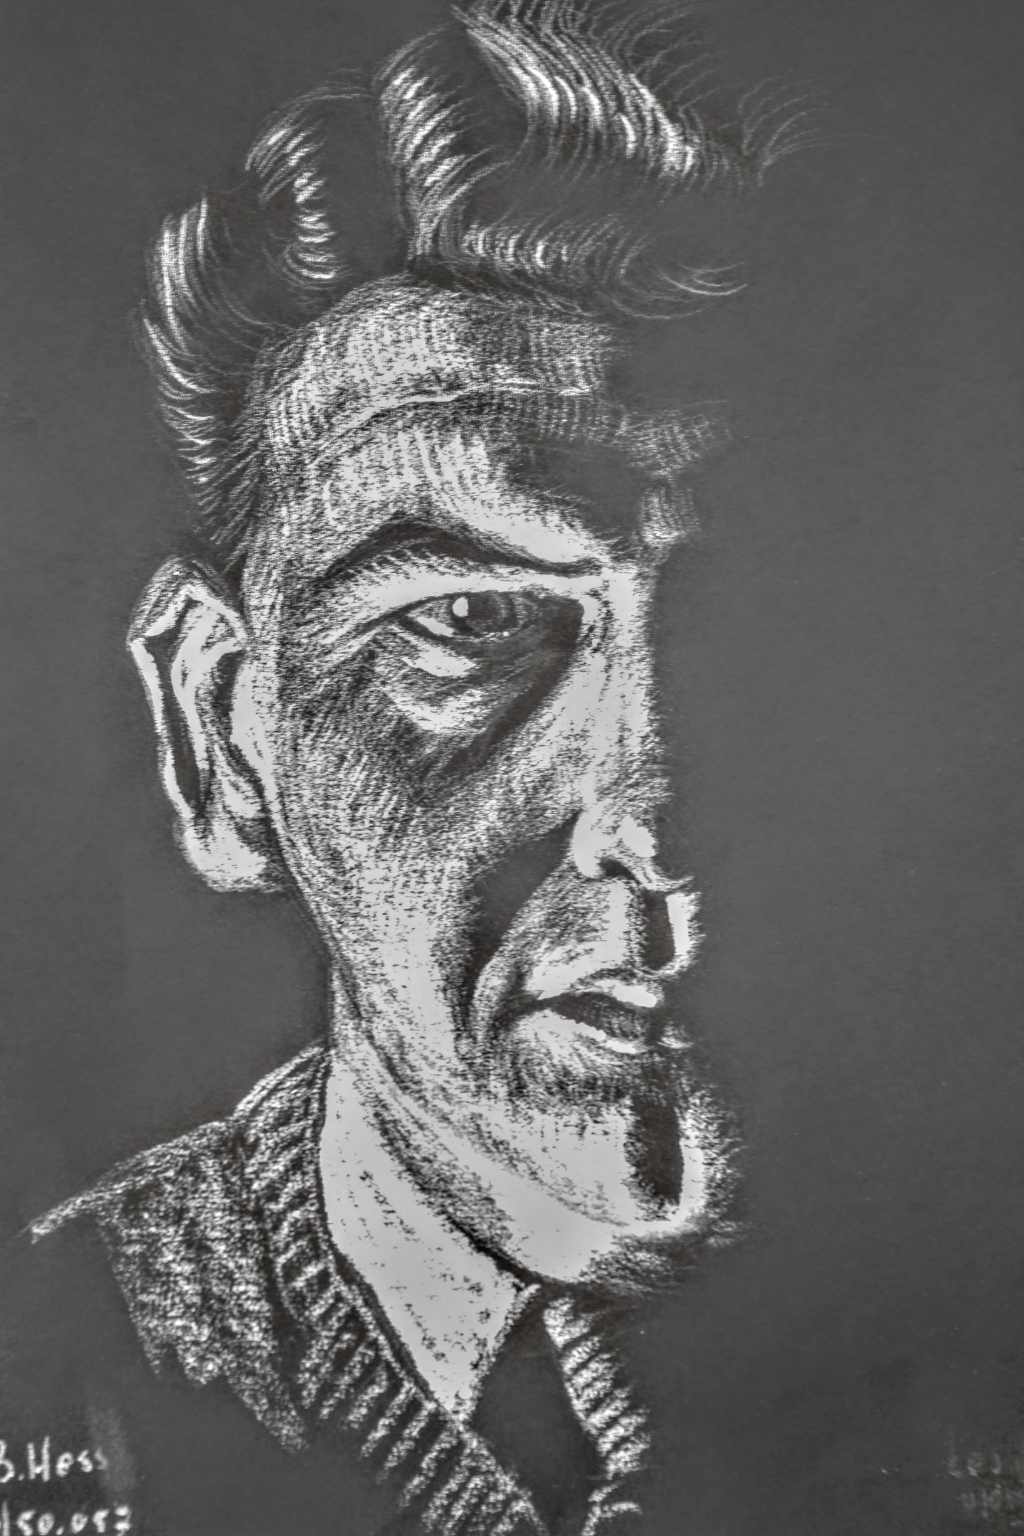 Hes zelfportret  © GGOF.nl